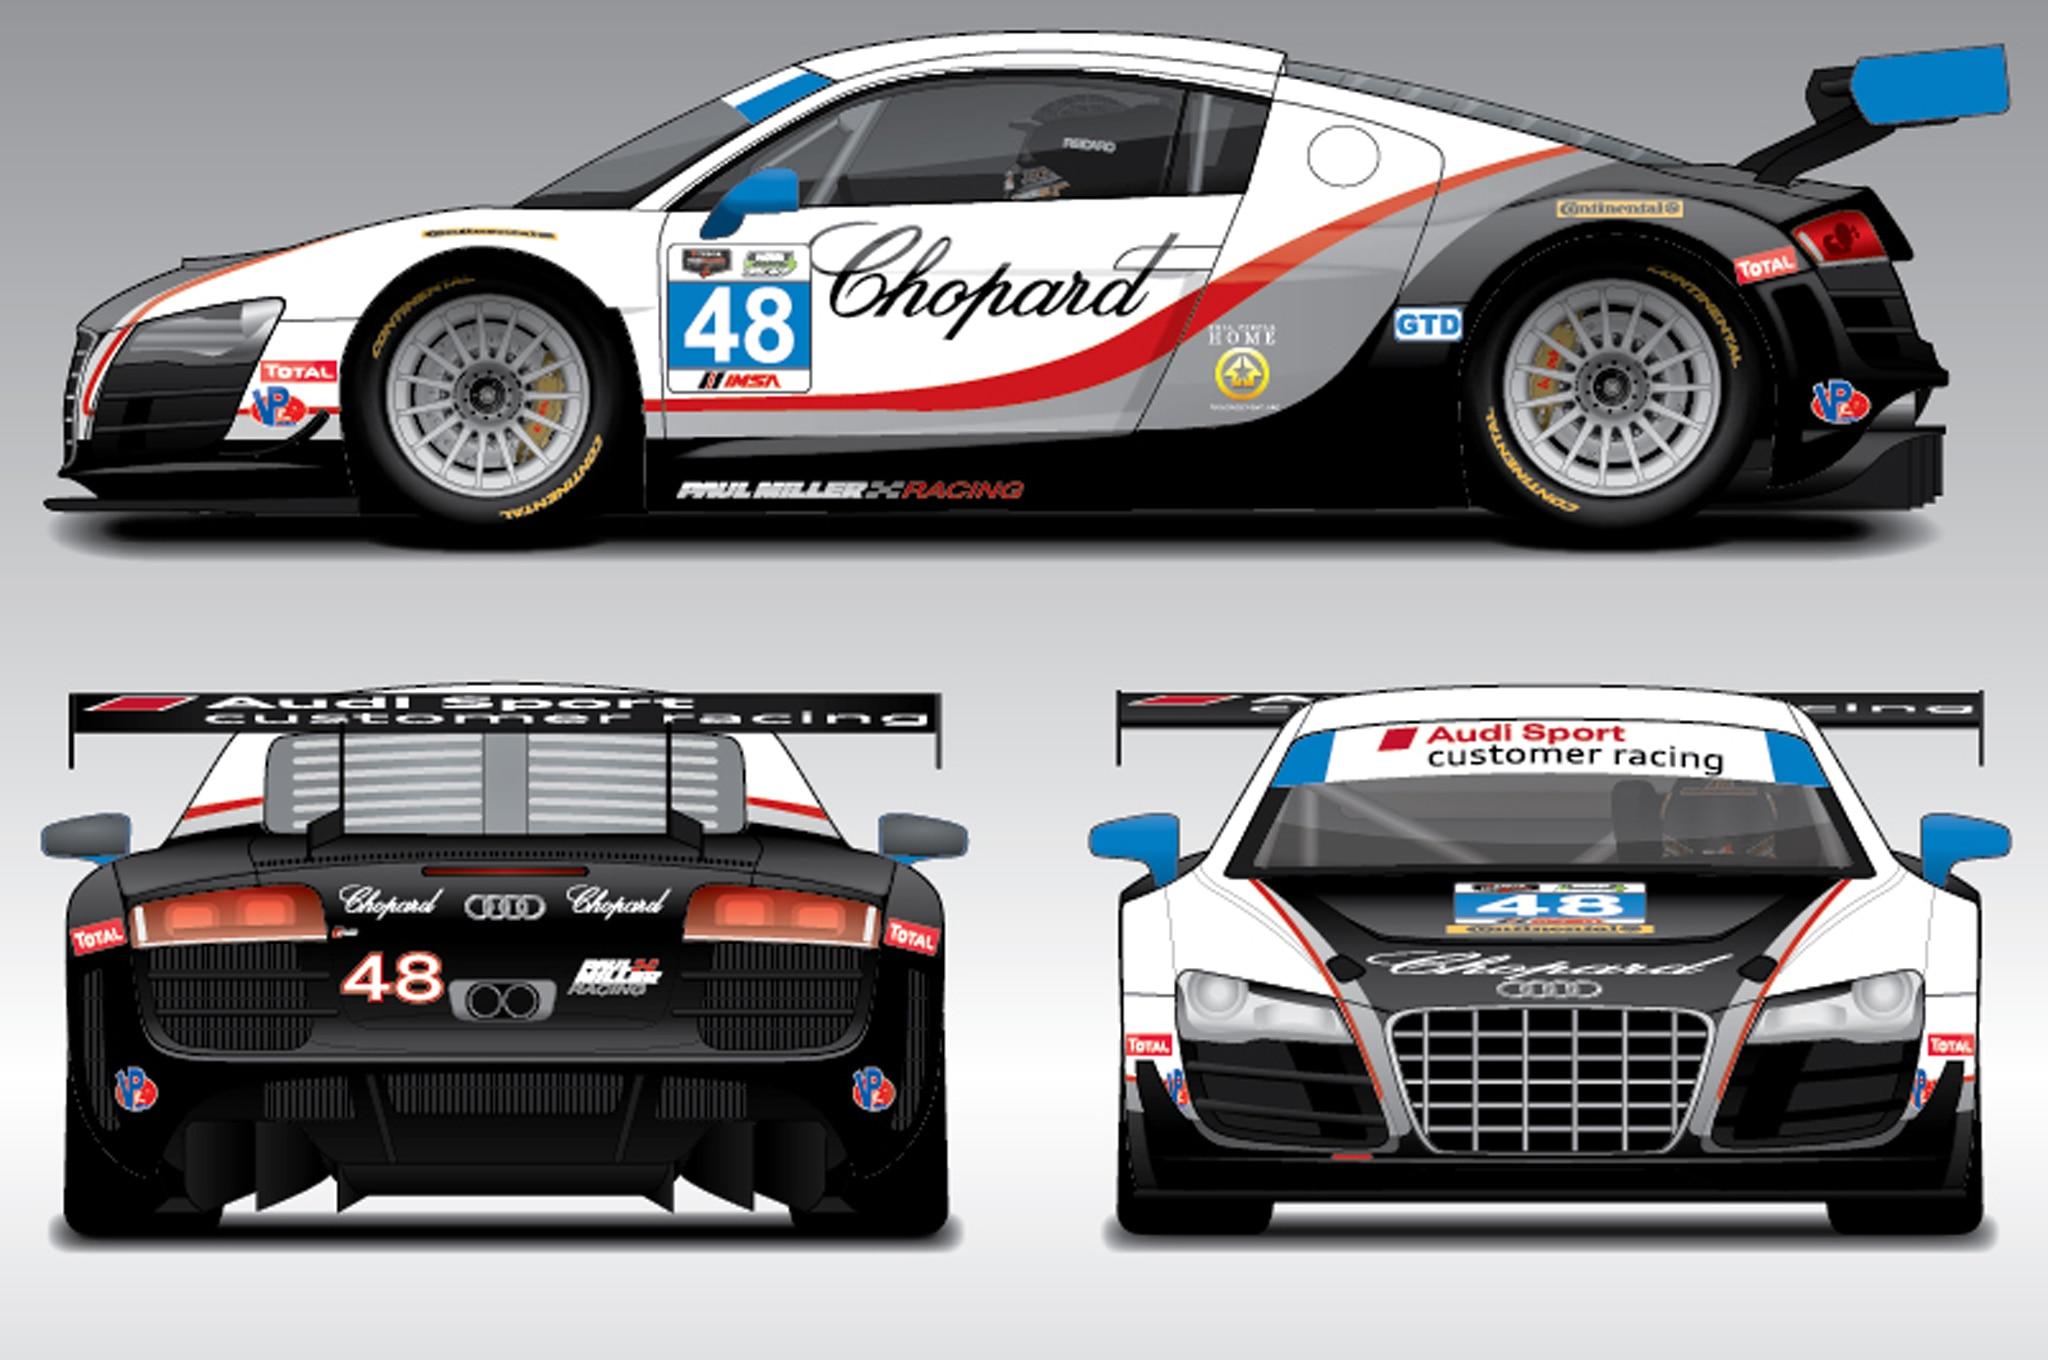 Audi Releases Liveries For Daytona R Endurance Racers Automobile - Paul miller audi